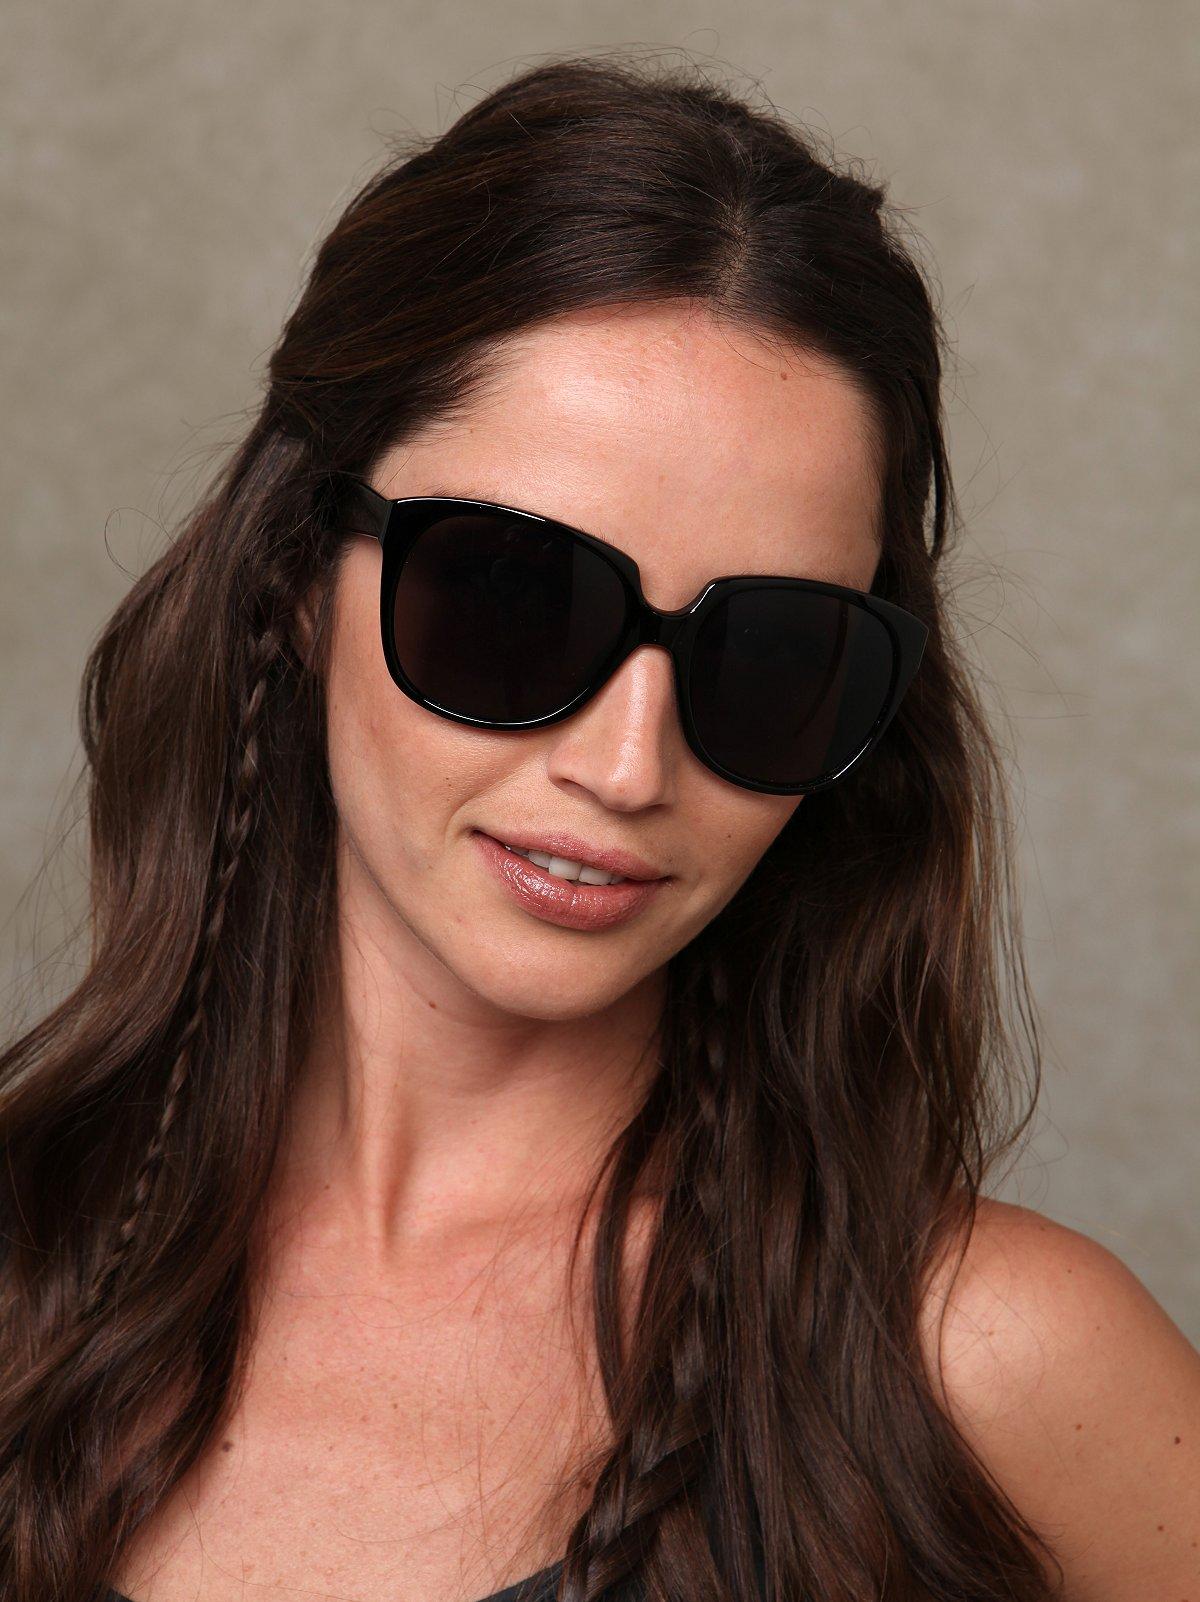 Veronica Sunglasses